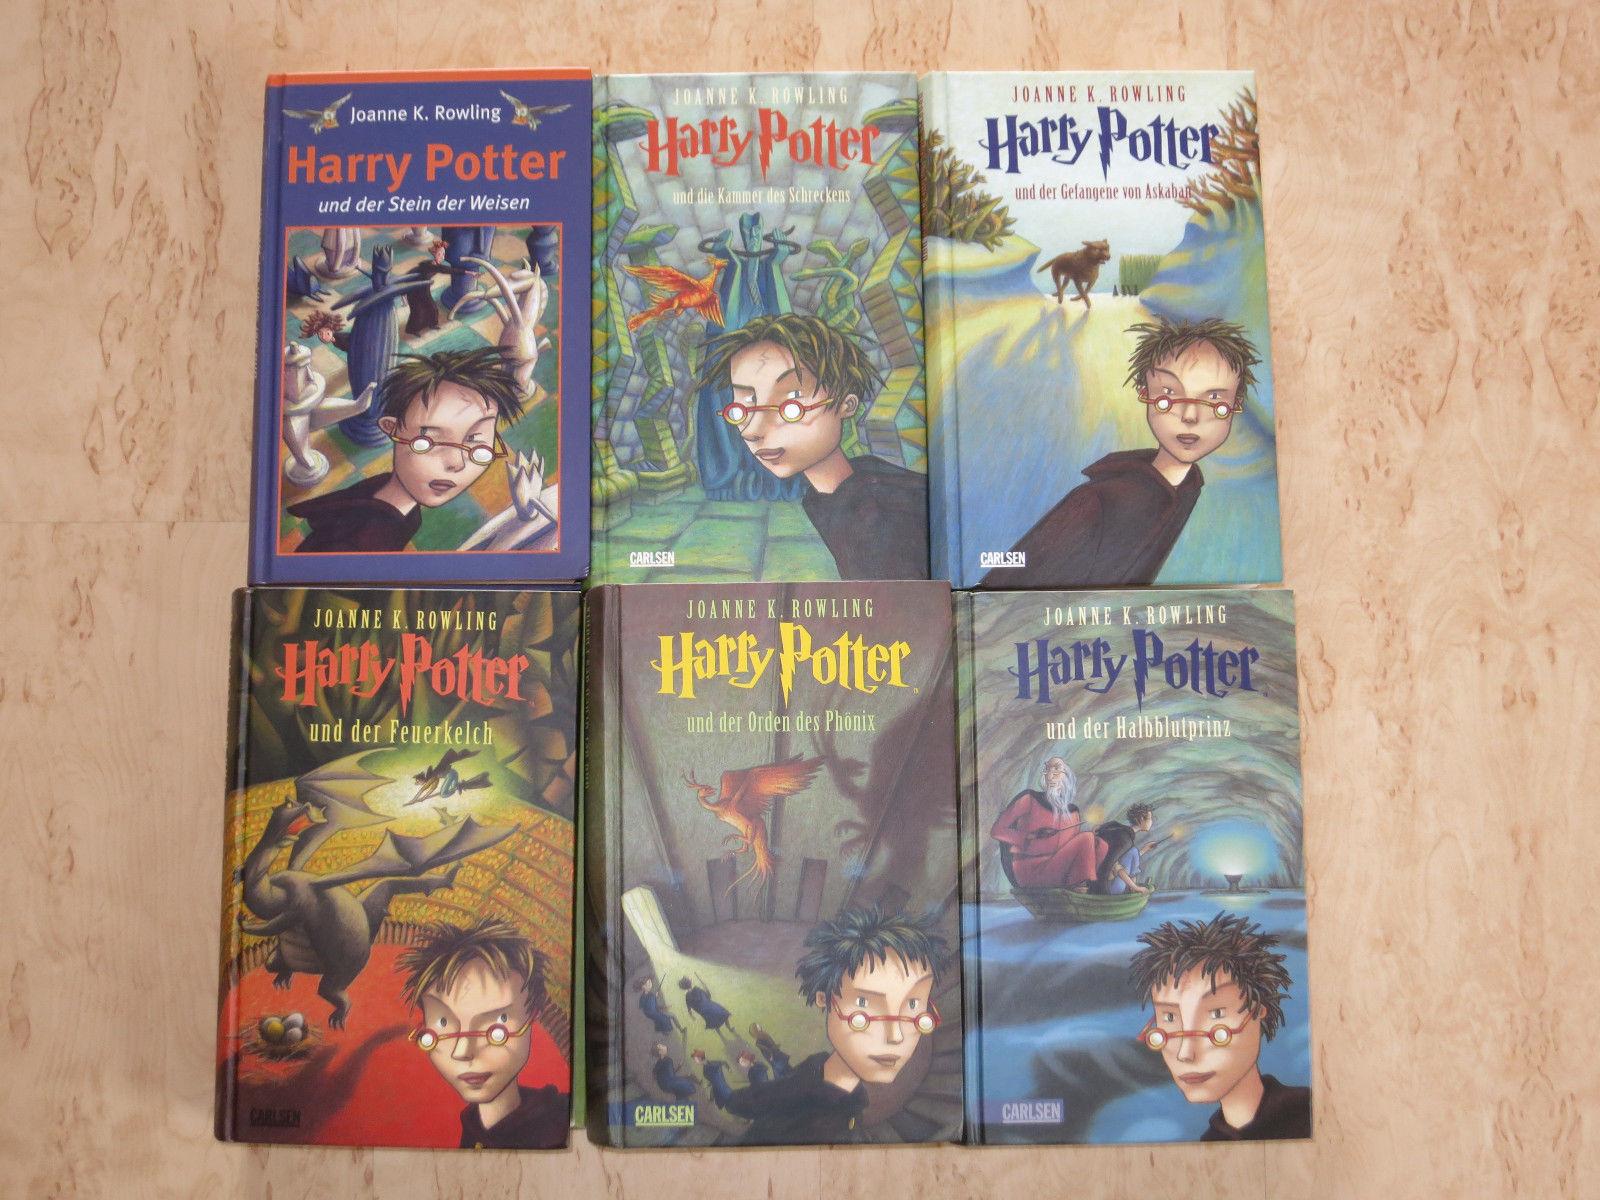 Joanne K. Rowling - Harry Potter Bücher Band 1-6 Hardcover